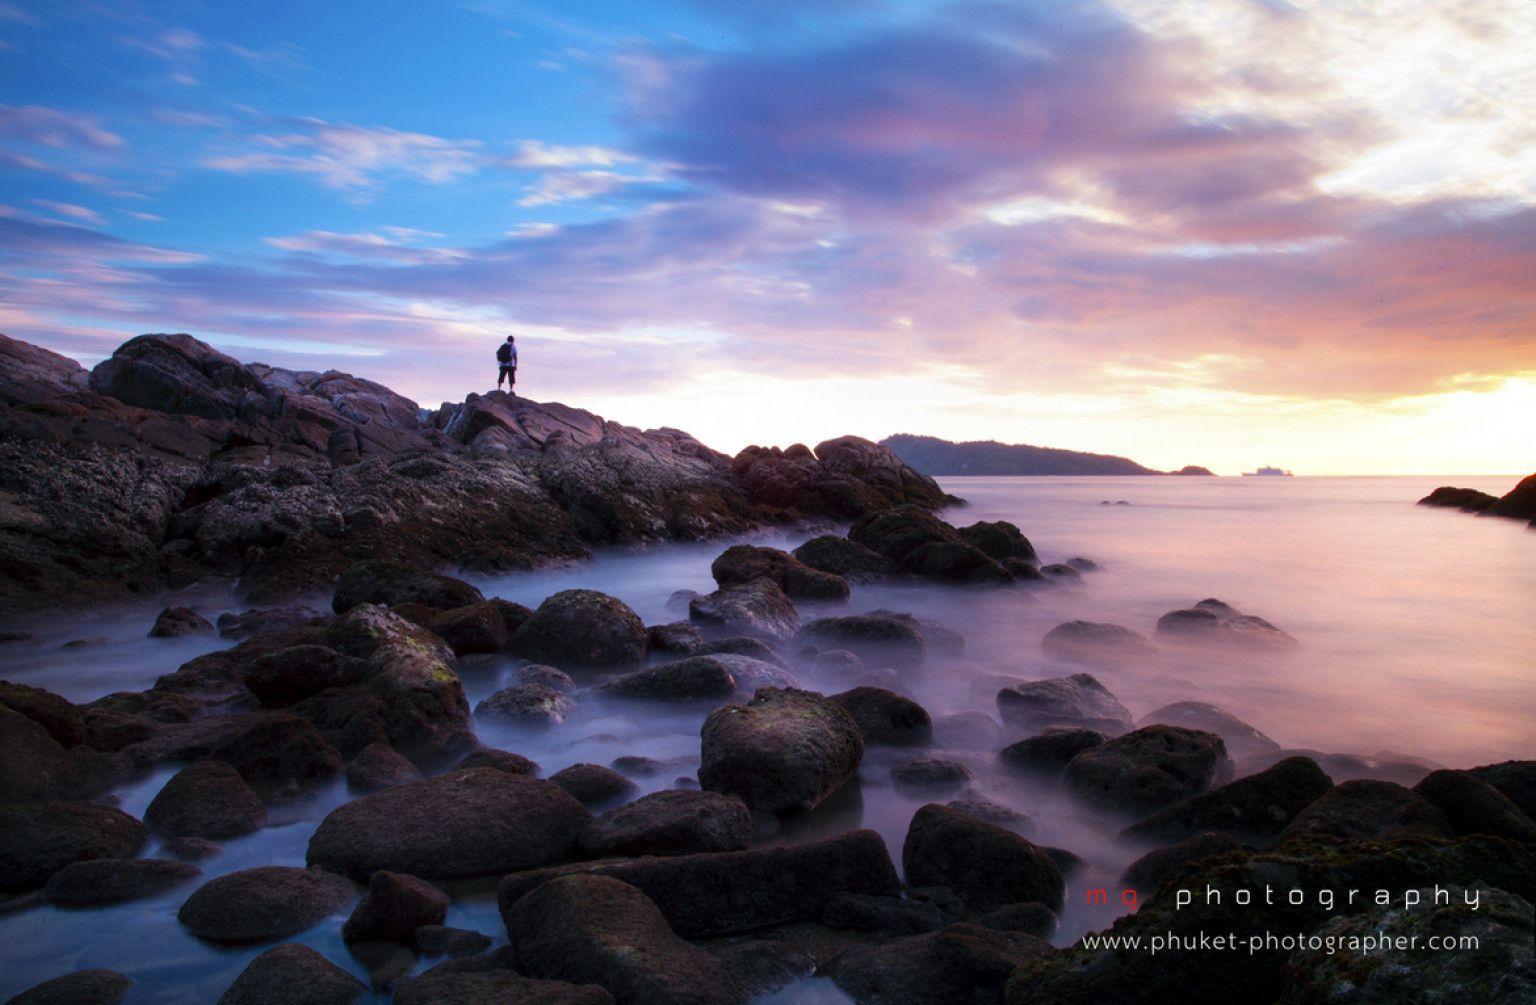 How To Take Stunning Sunset Photos